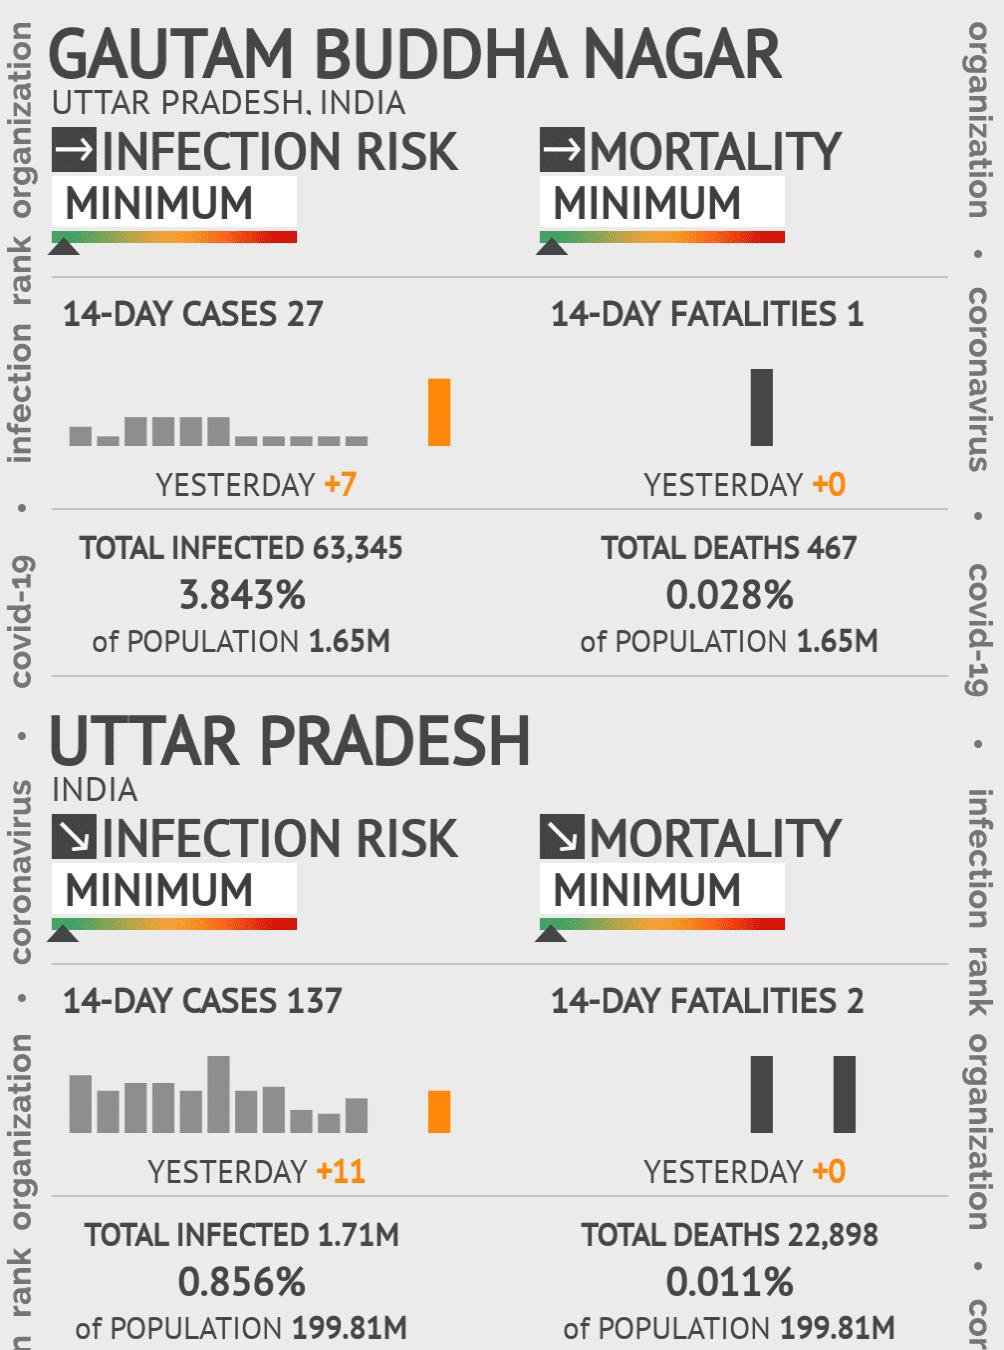 Gautam Buddha Nagar Coronavirus Covid-19 Risk of Infection on February 23, 2021